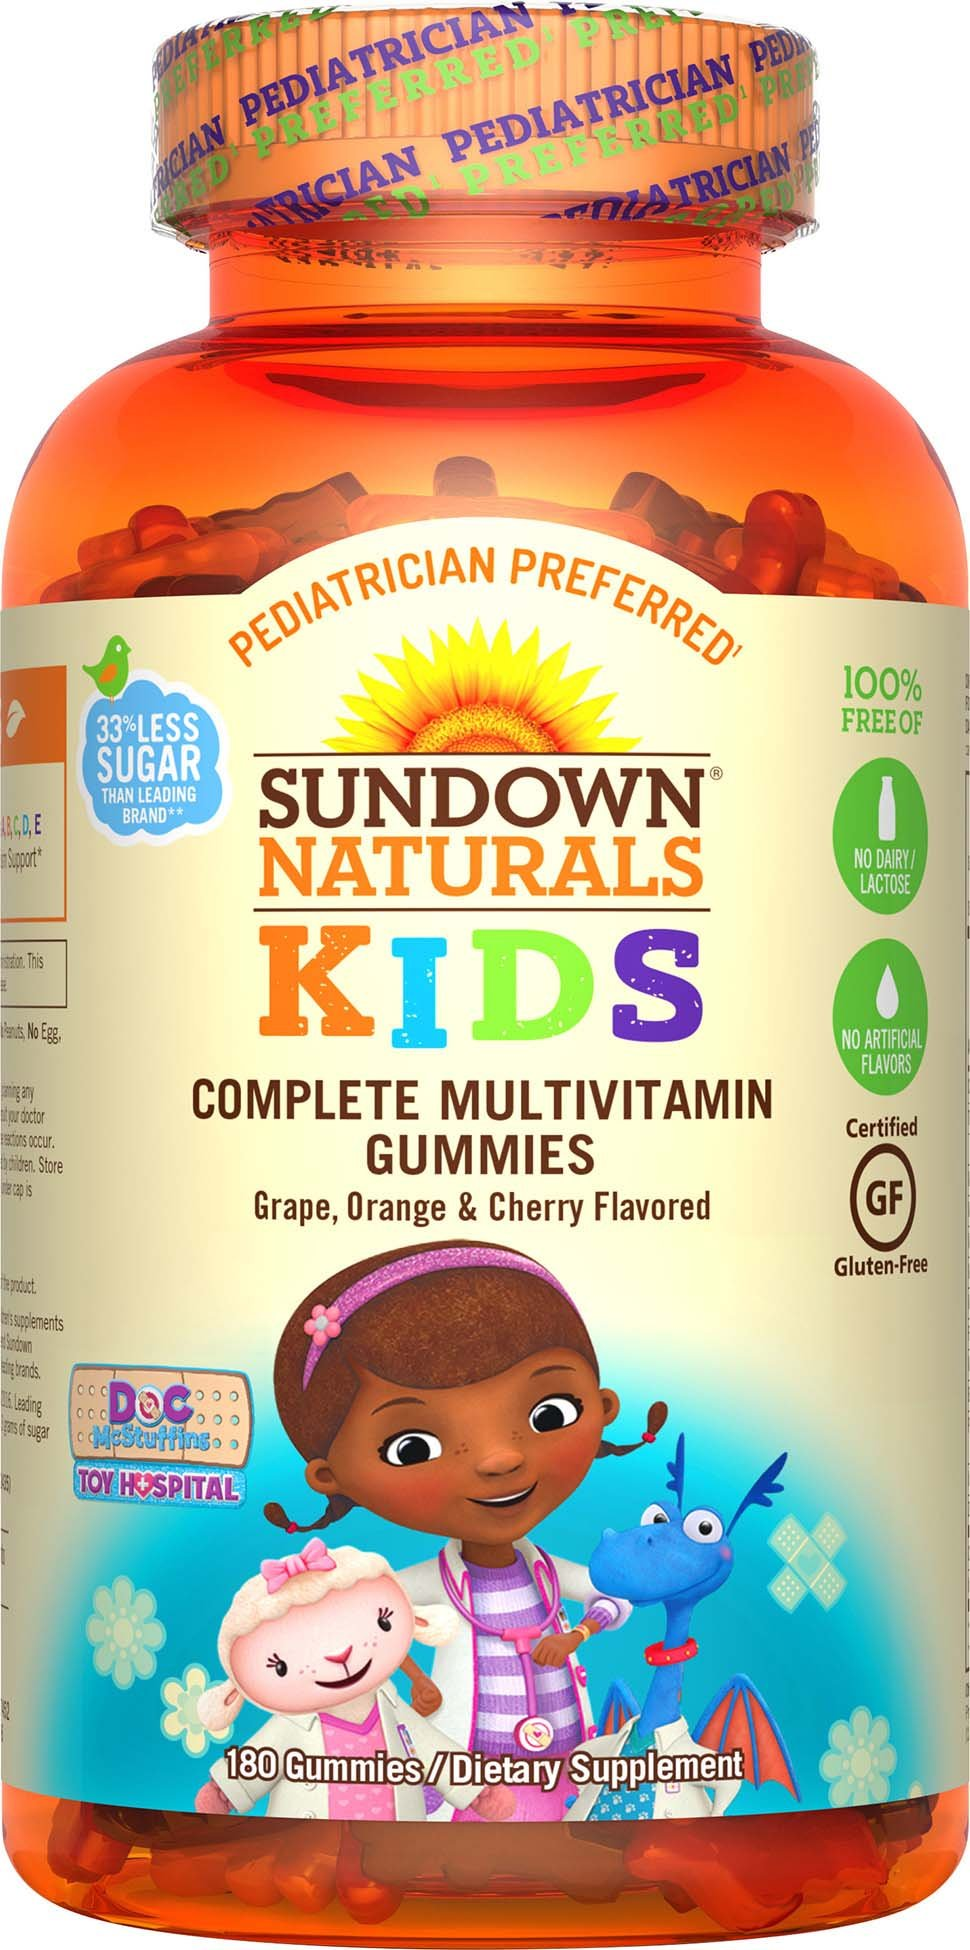 Sundown Naturals Kids Disney Doc Mcstuffins Complete Multivitamin, 180 Count